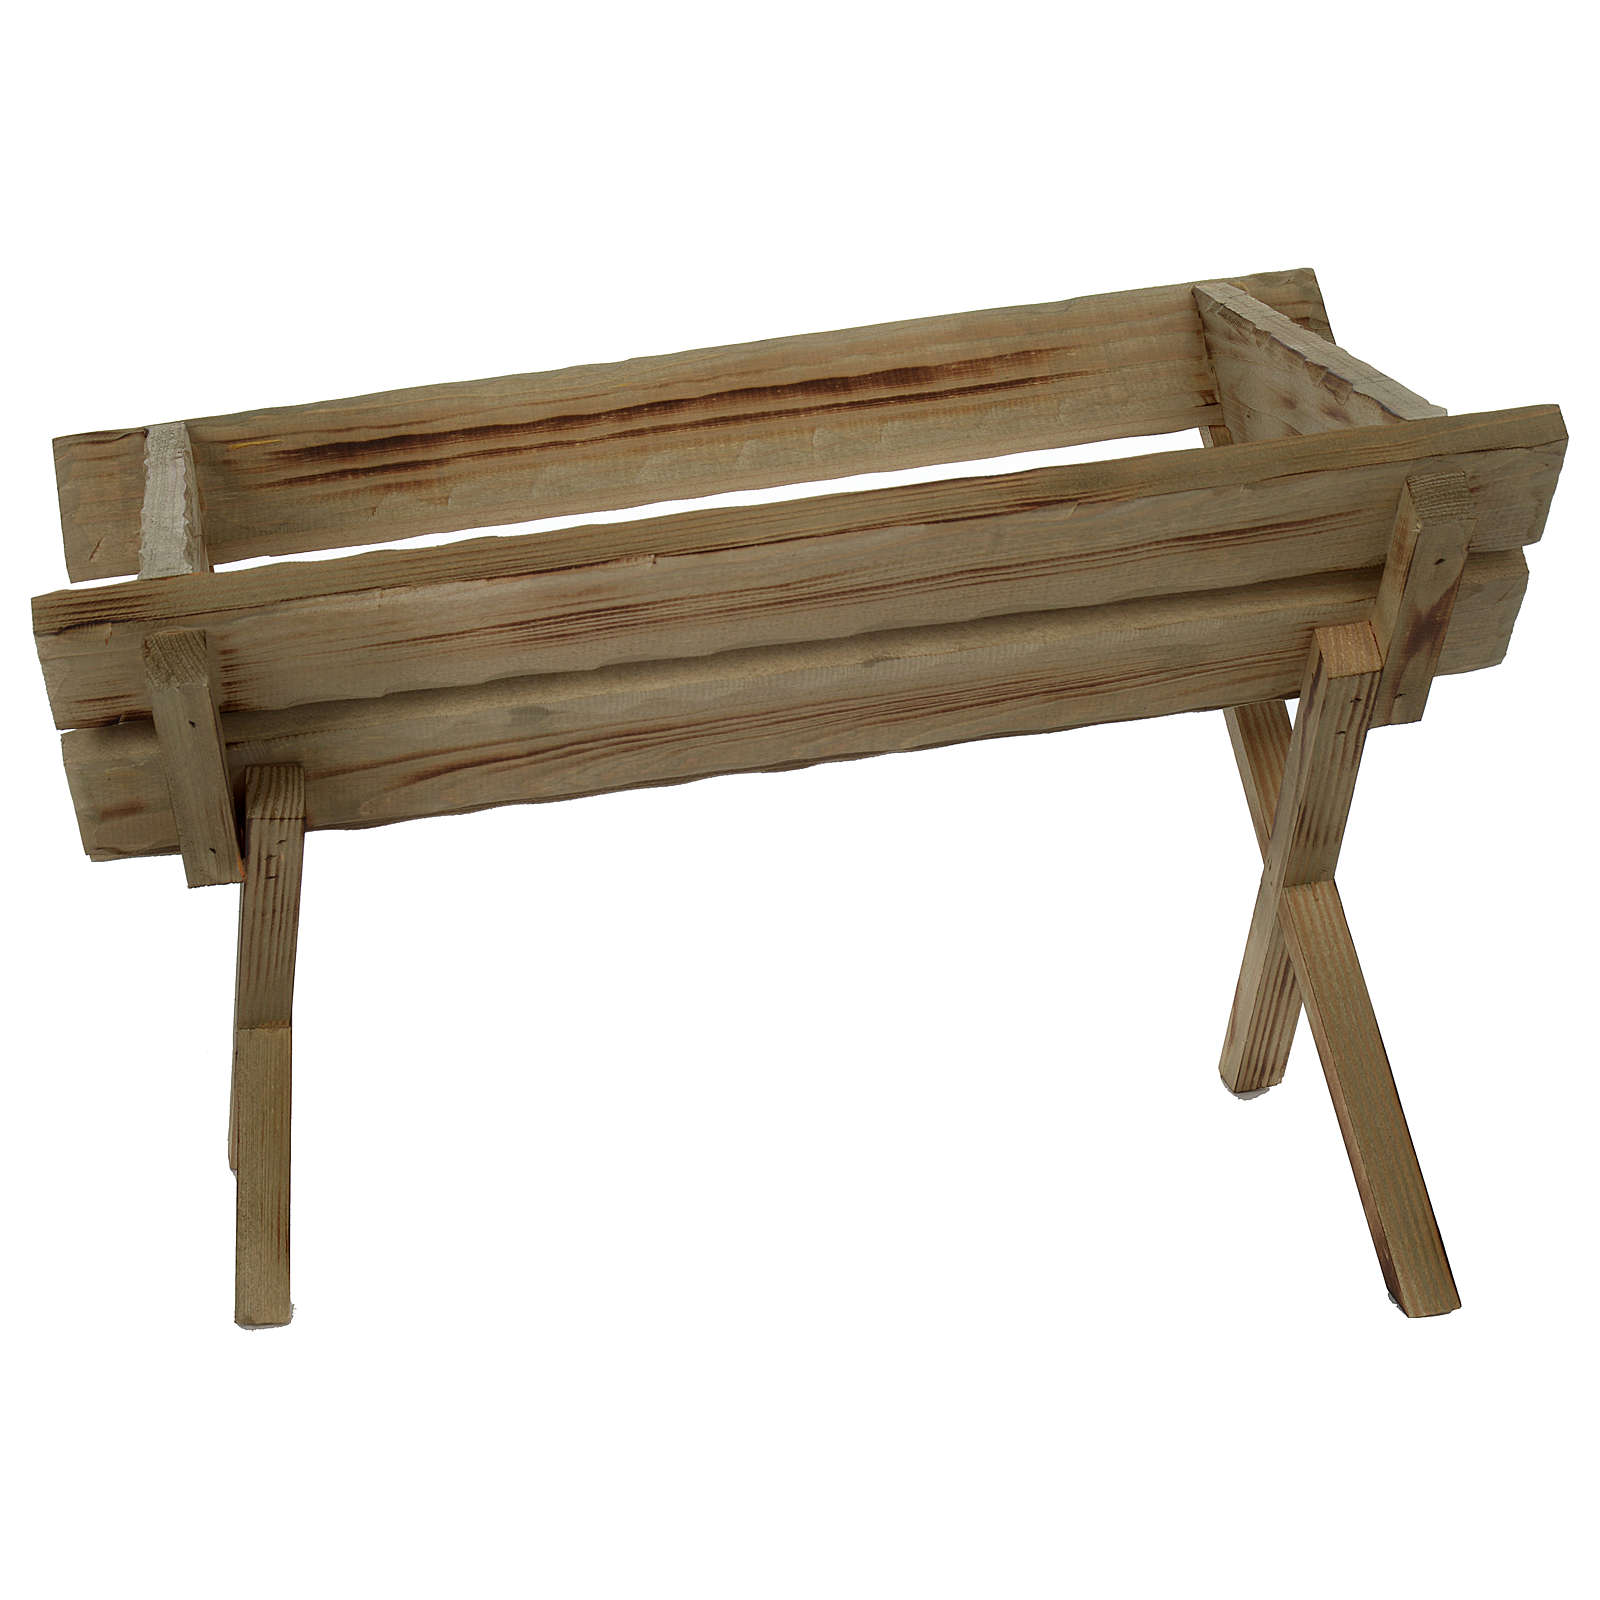 Culla in legno per Gesù Bambino presepe 150 cm 3